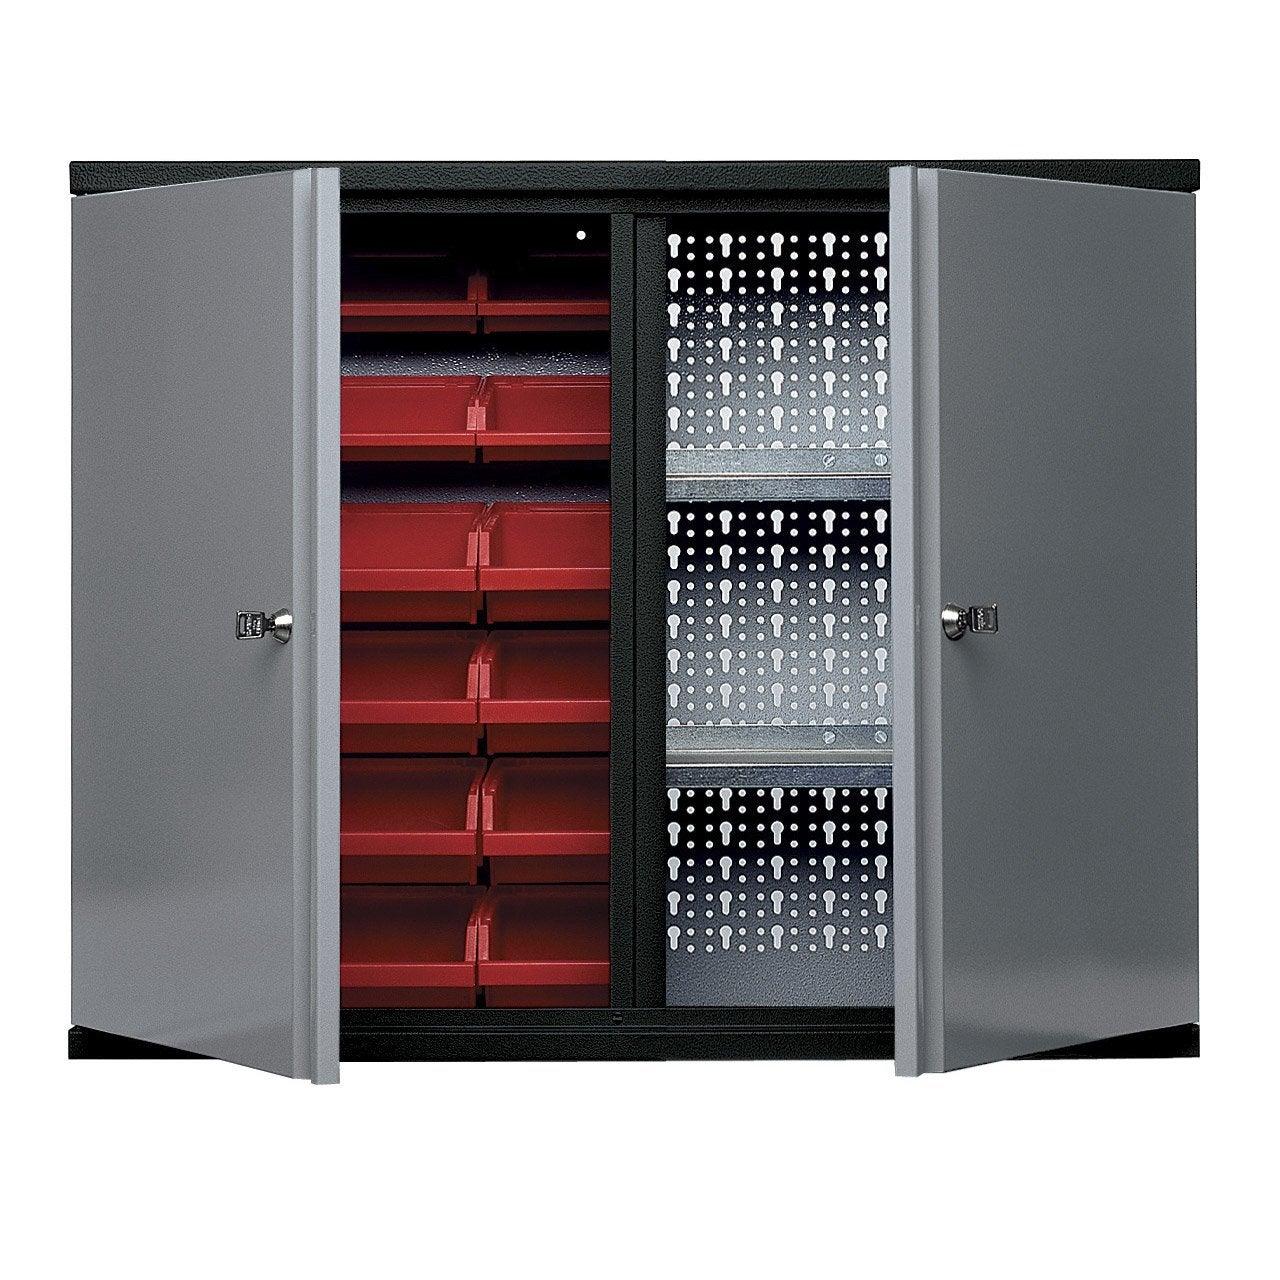 armoire de rangement avec 18 bo tes becs kupper 60 cm 2 portes leroy merlin. Black Bedroom Furniture Sets. Home Design Ideas